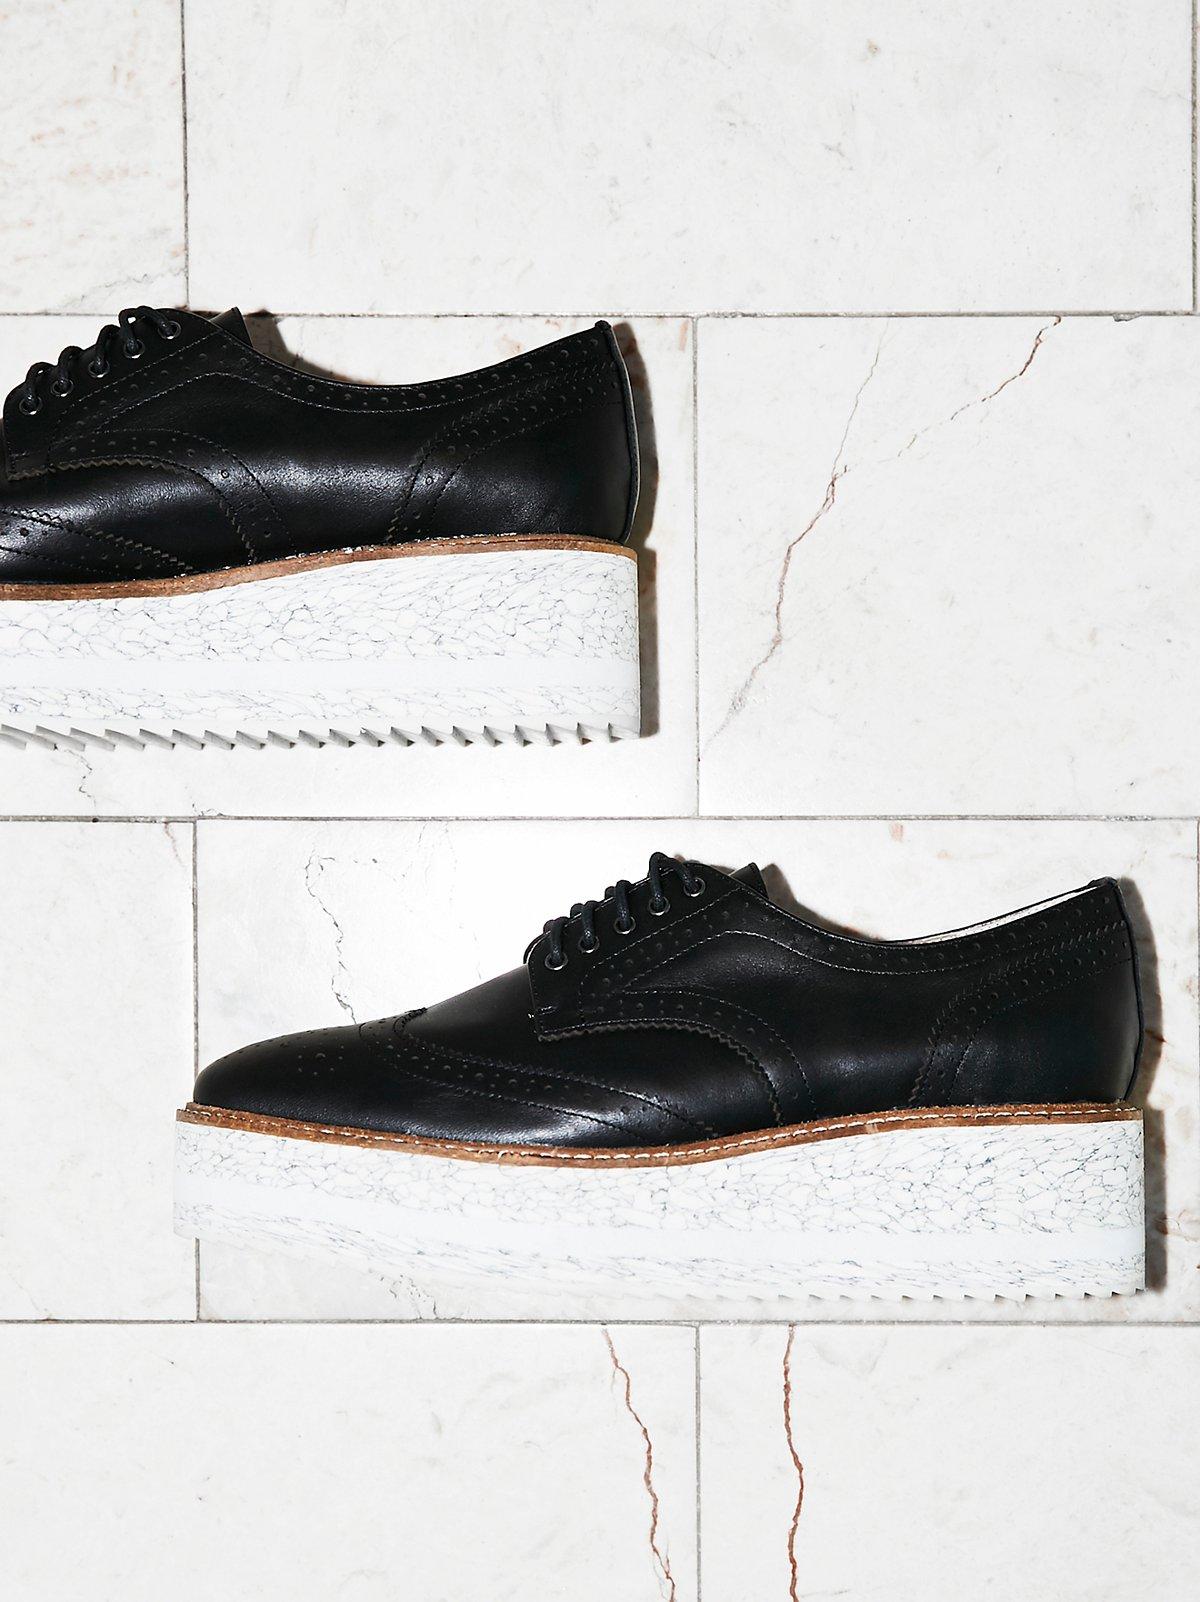 Limelight厚底休闲鞋